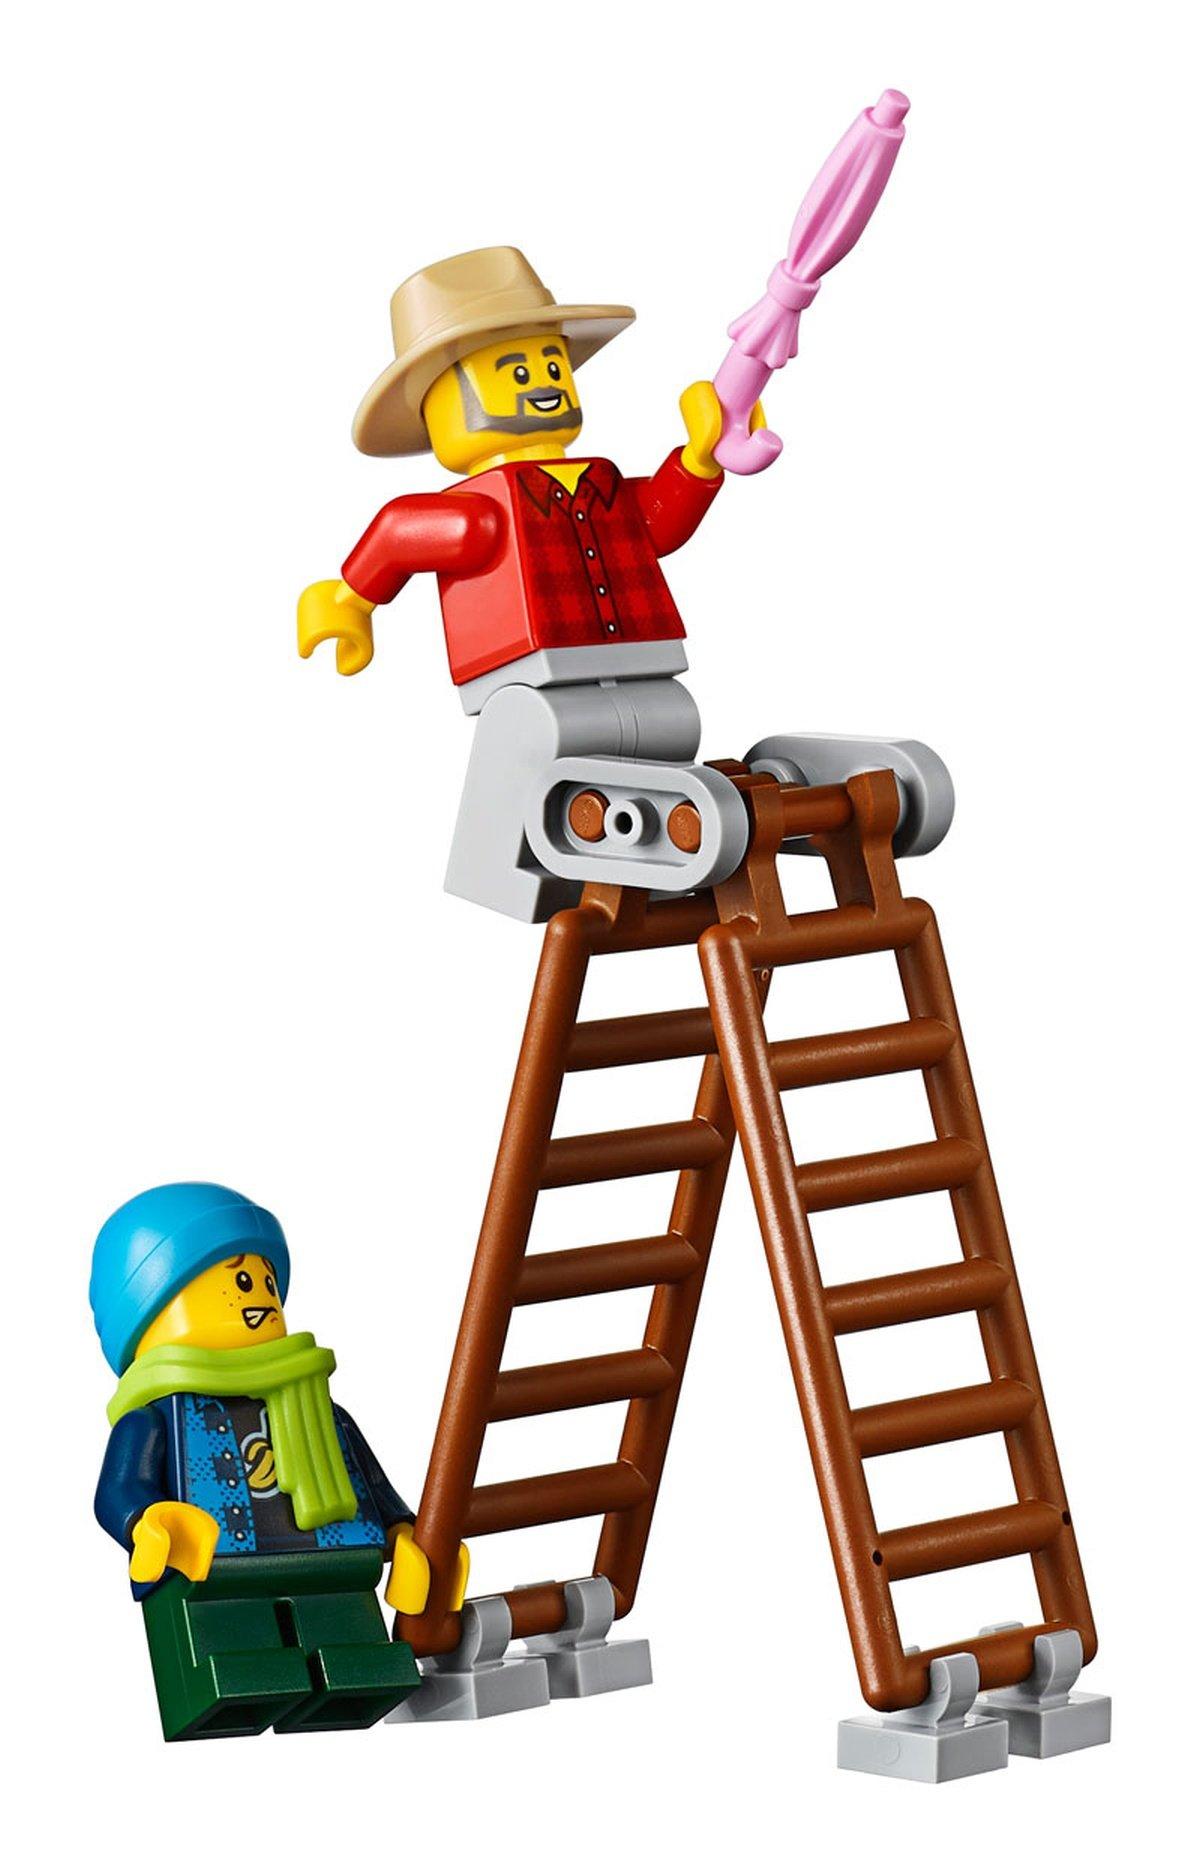 LEGO 10270 Creator Expert Modular Bookshop minifigure details